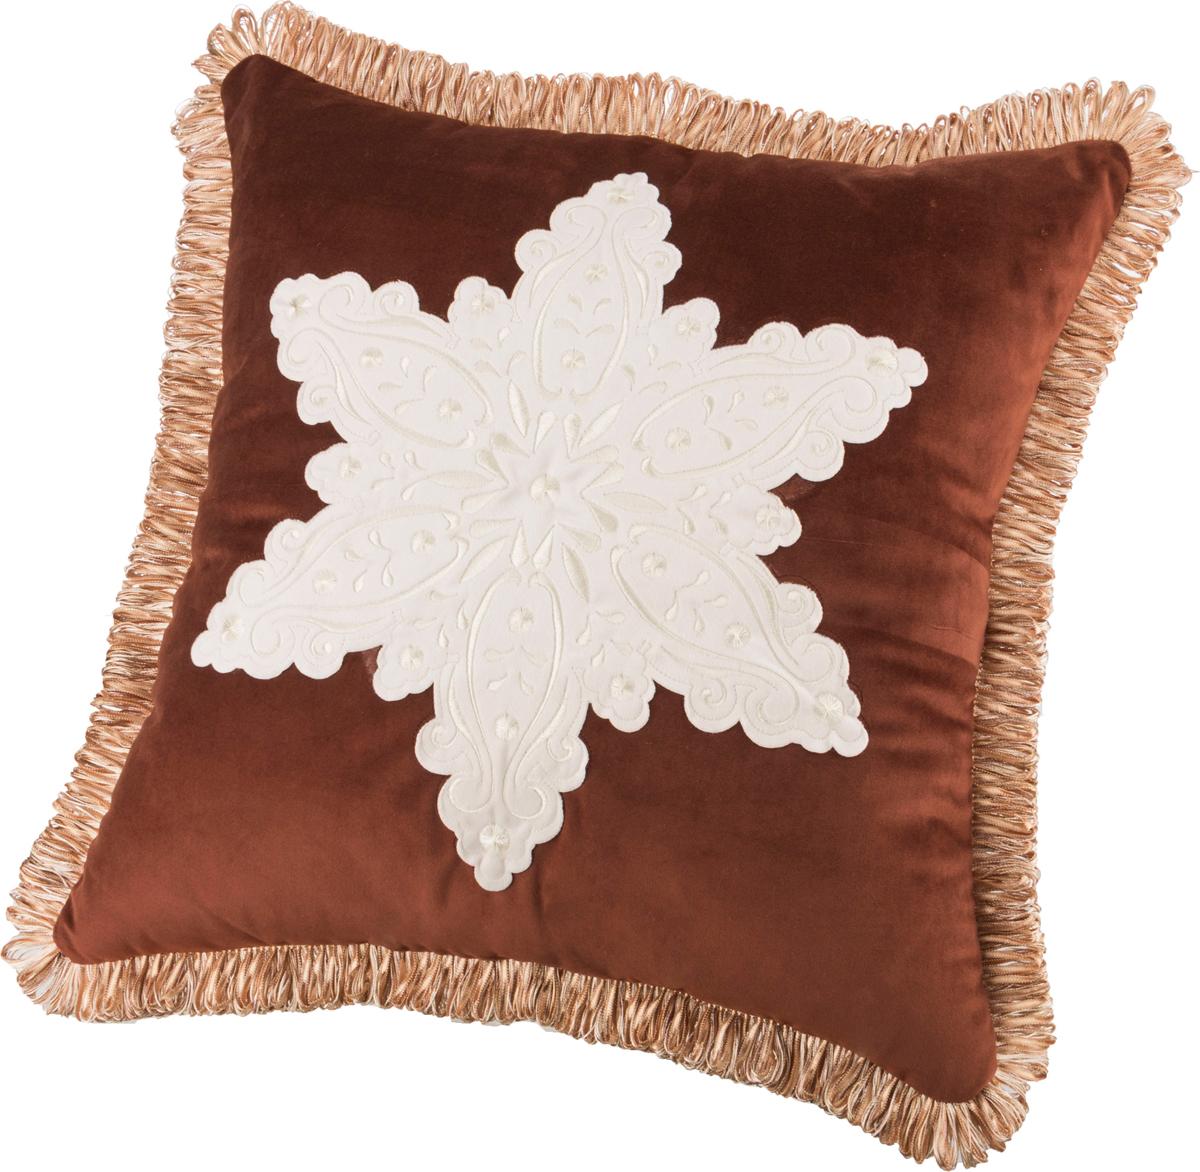 Декоративная подушка 850-817-07 снежинка коричневая 46*46 см